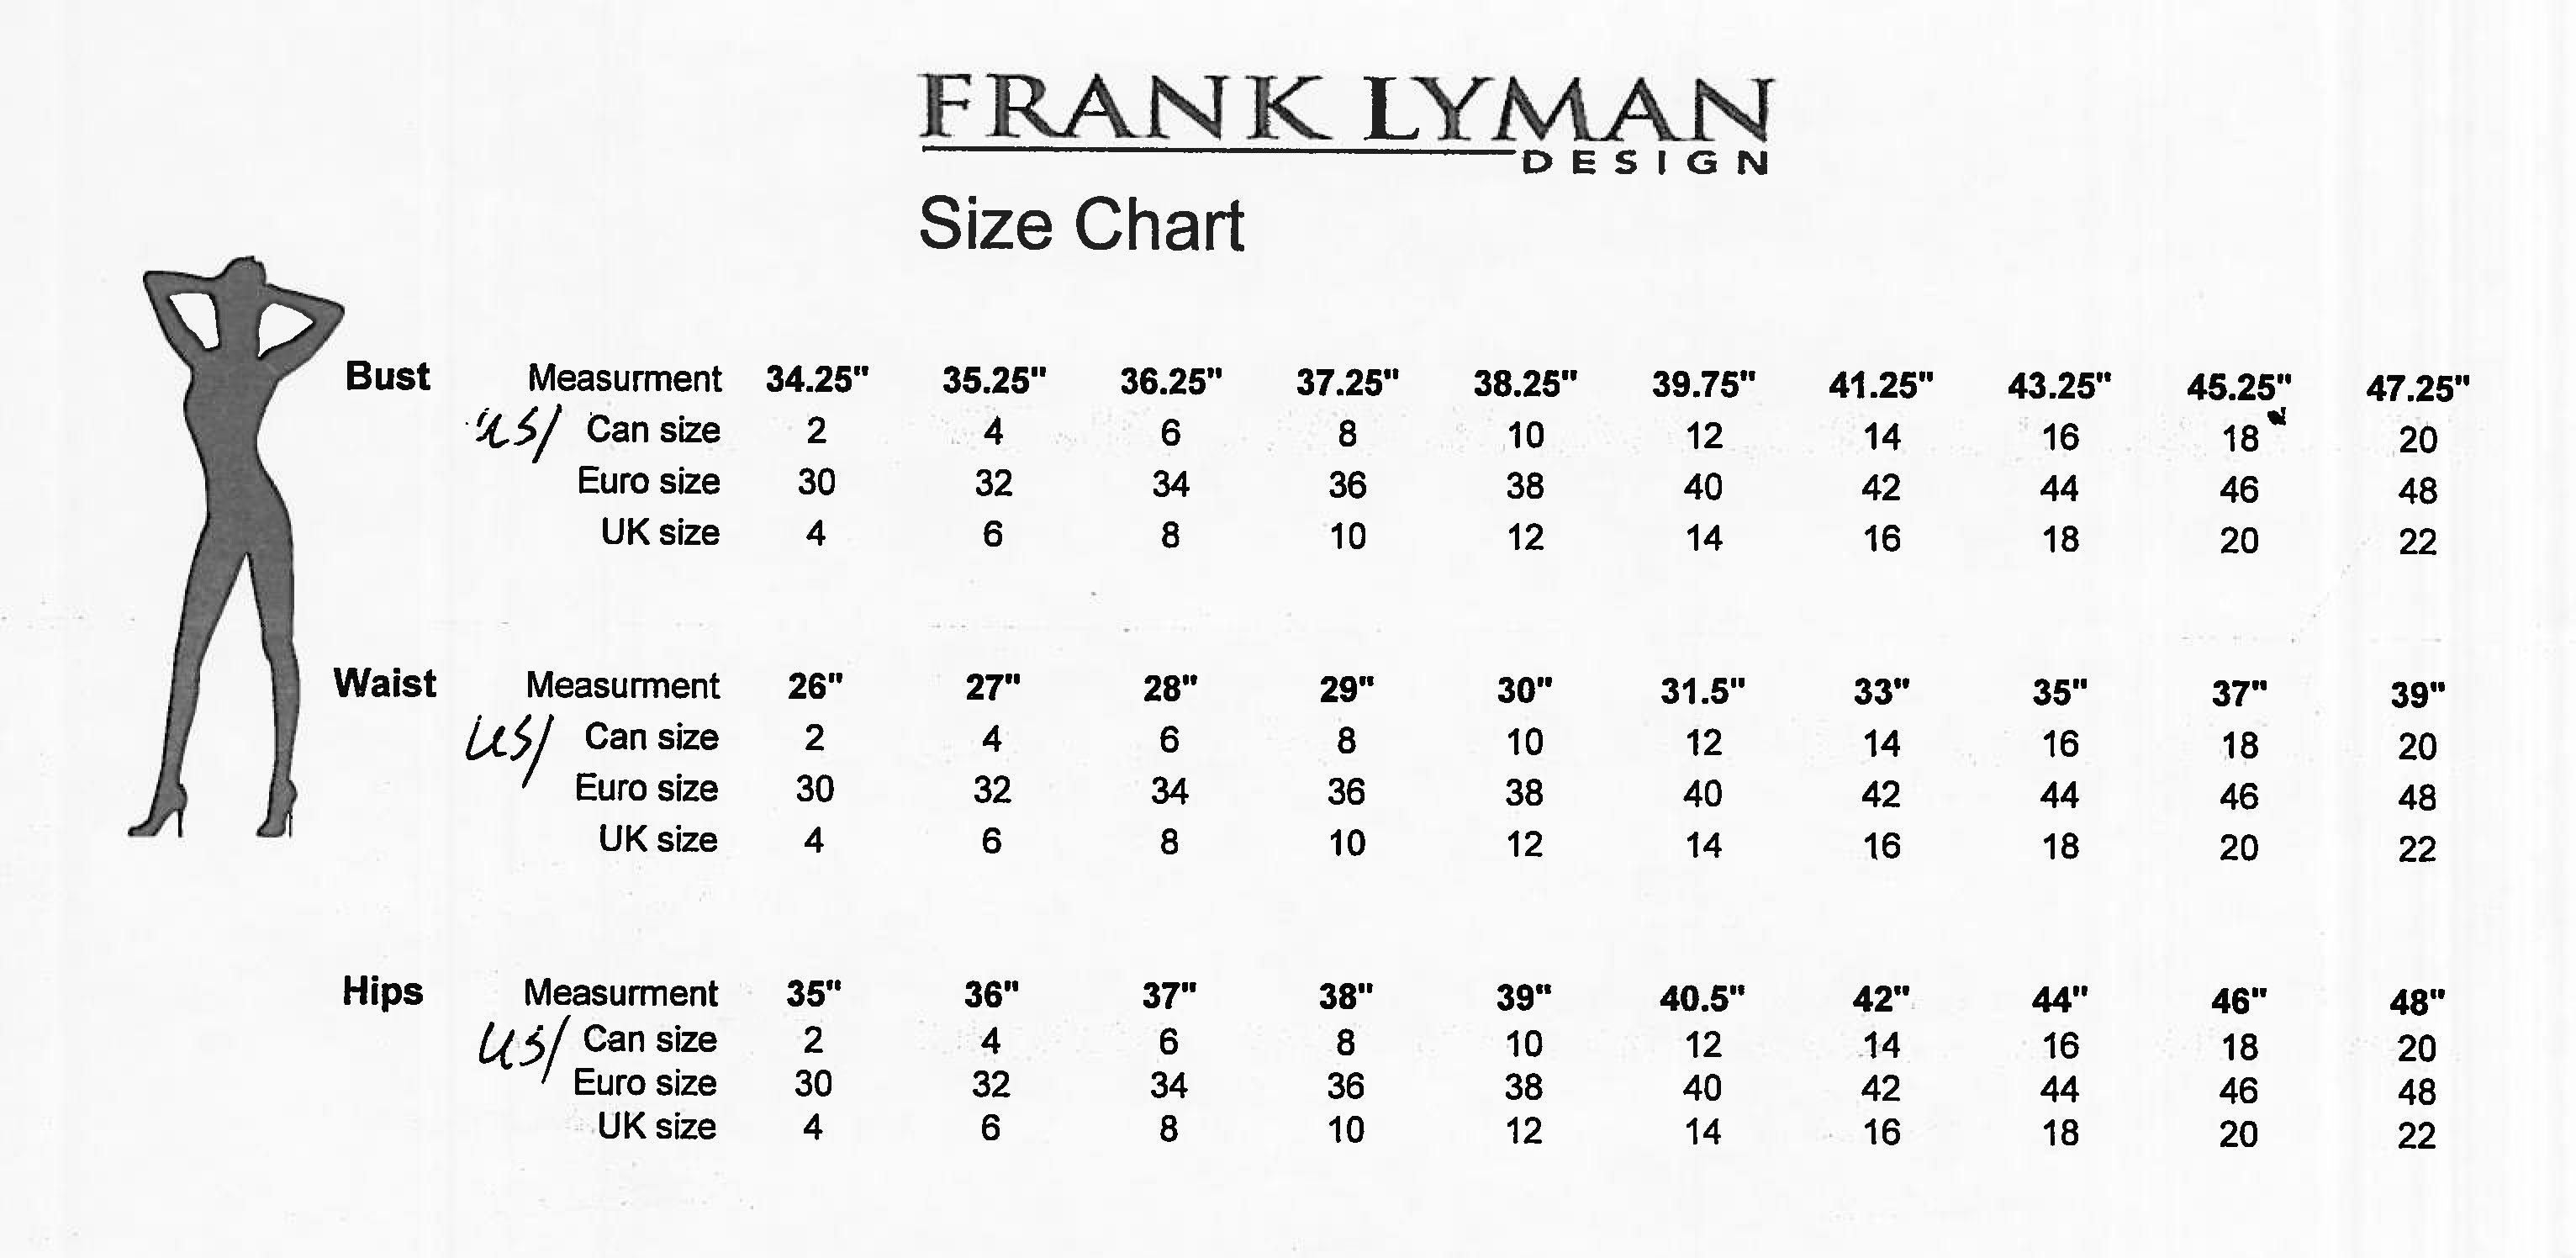 Frank Lyman Size Chart Best Dresses 2019